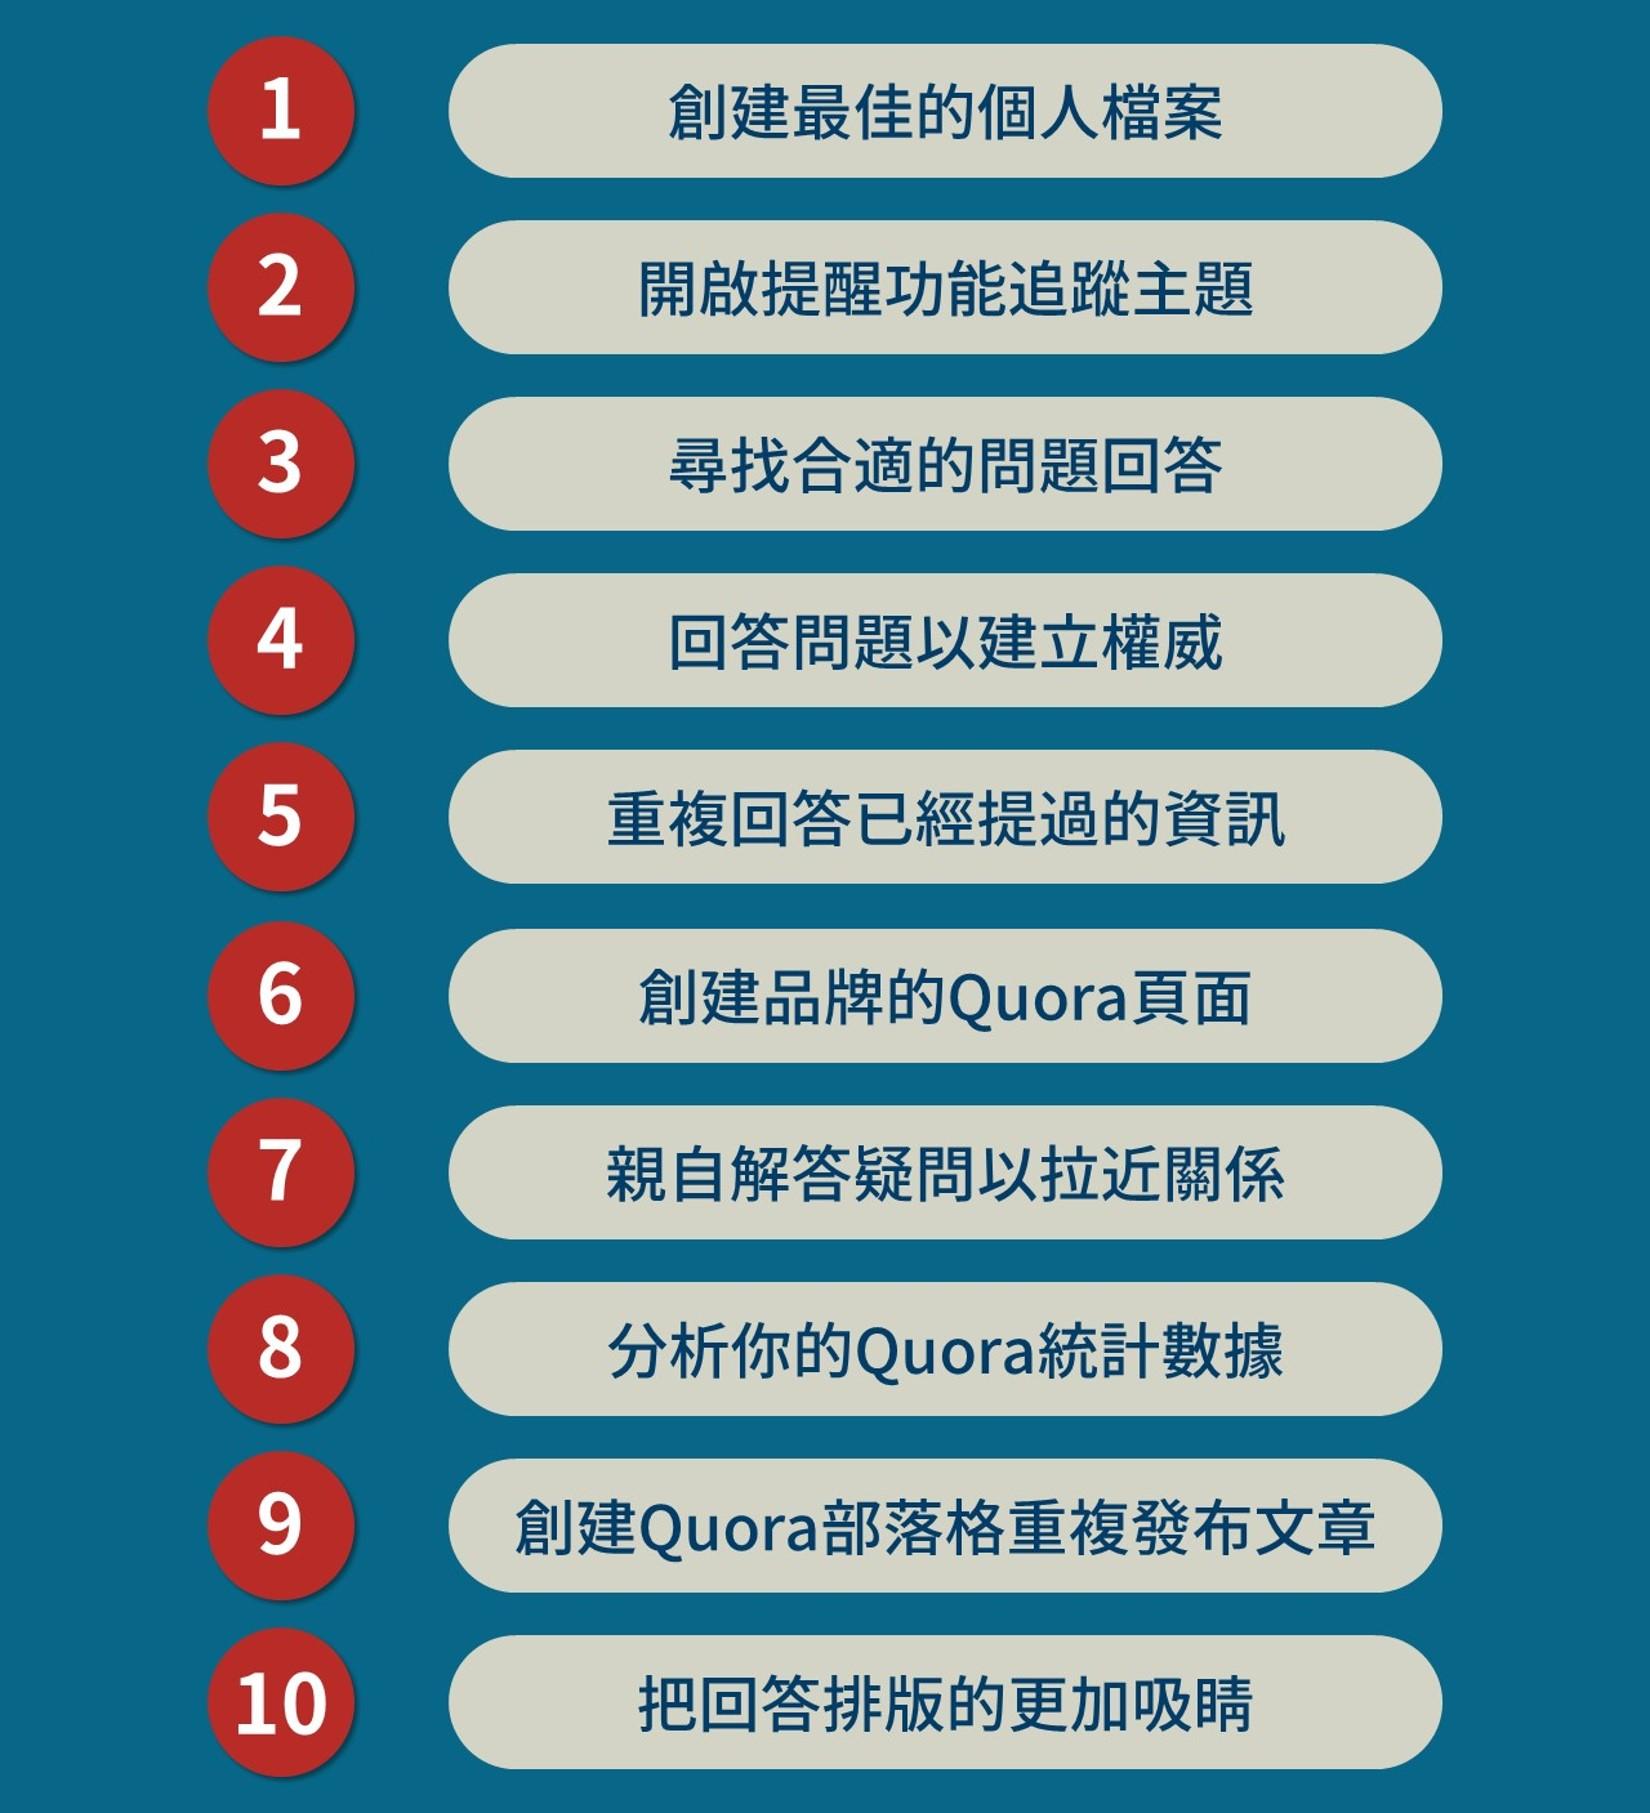 10招使用Quora行銷的技巧.png